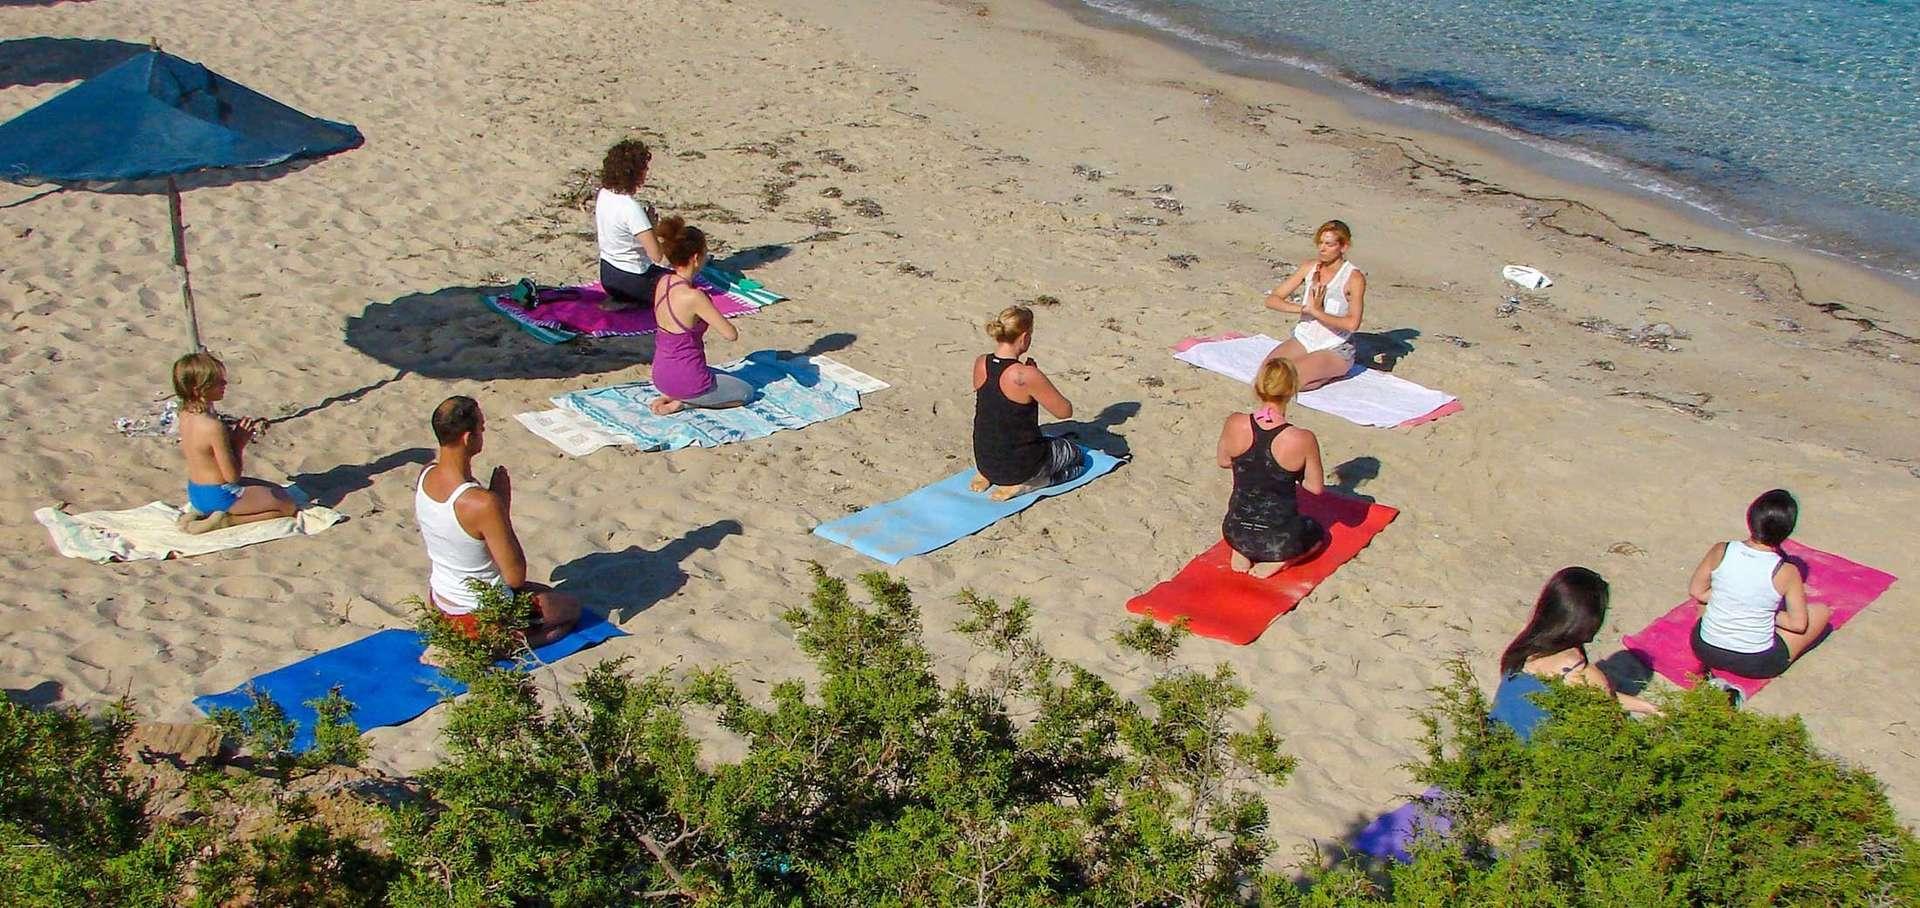 kerveli luxury villa - yogalessen op strand.jpg